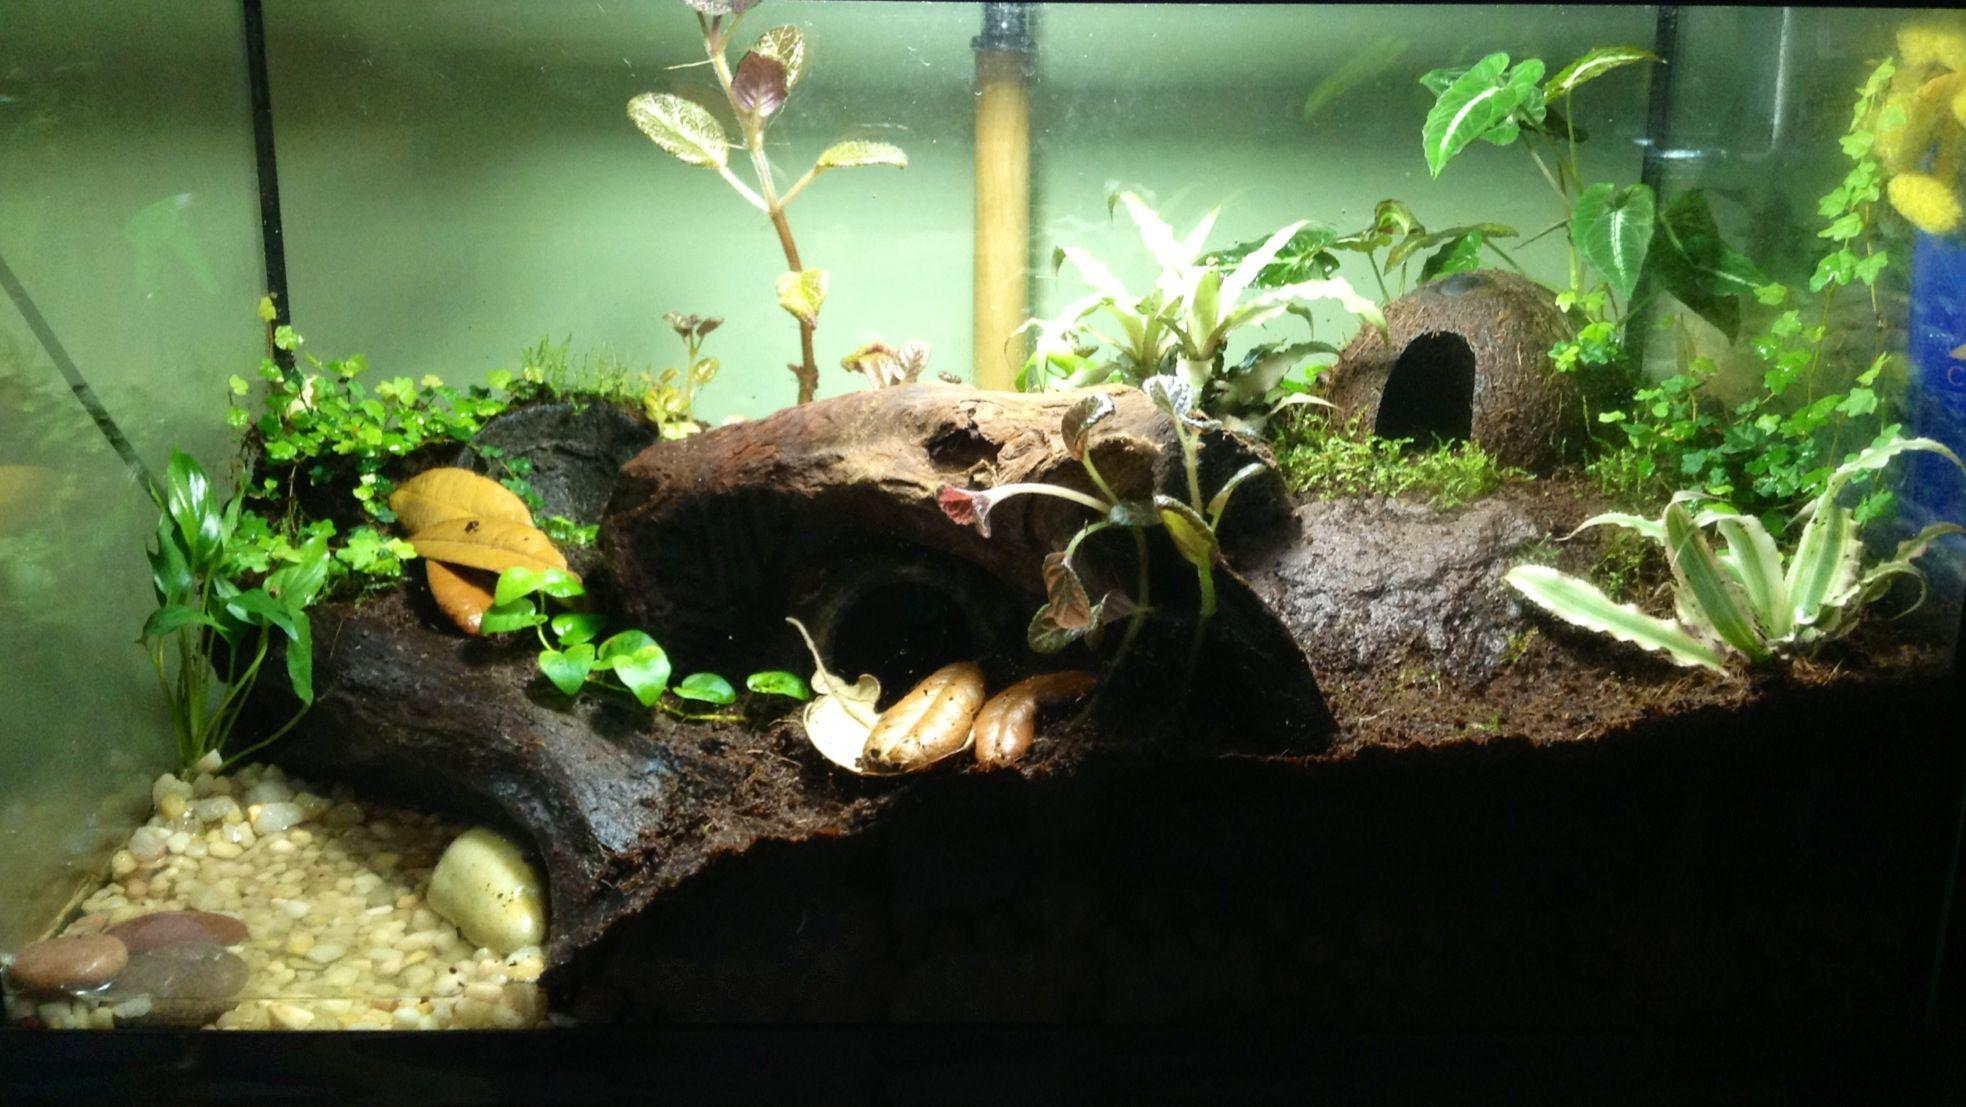 10 gallon dart frog vivarium | Tanks and vivariums ... 10 Gallon Dart Frog Vivarium